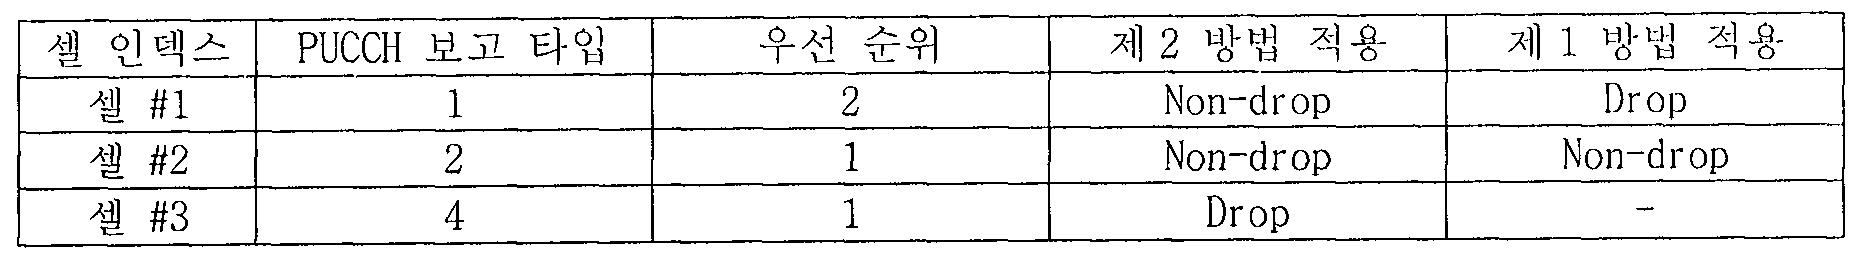 Figure 112011502155947-pat00030